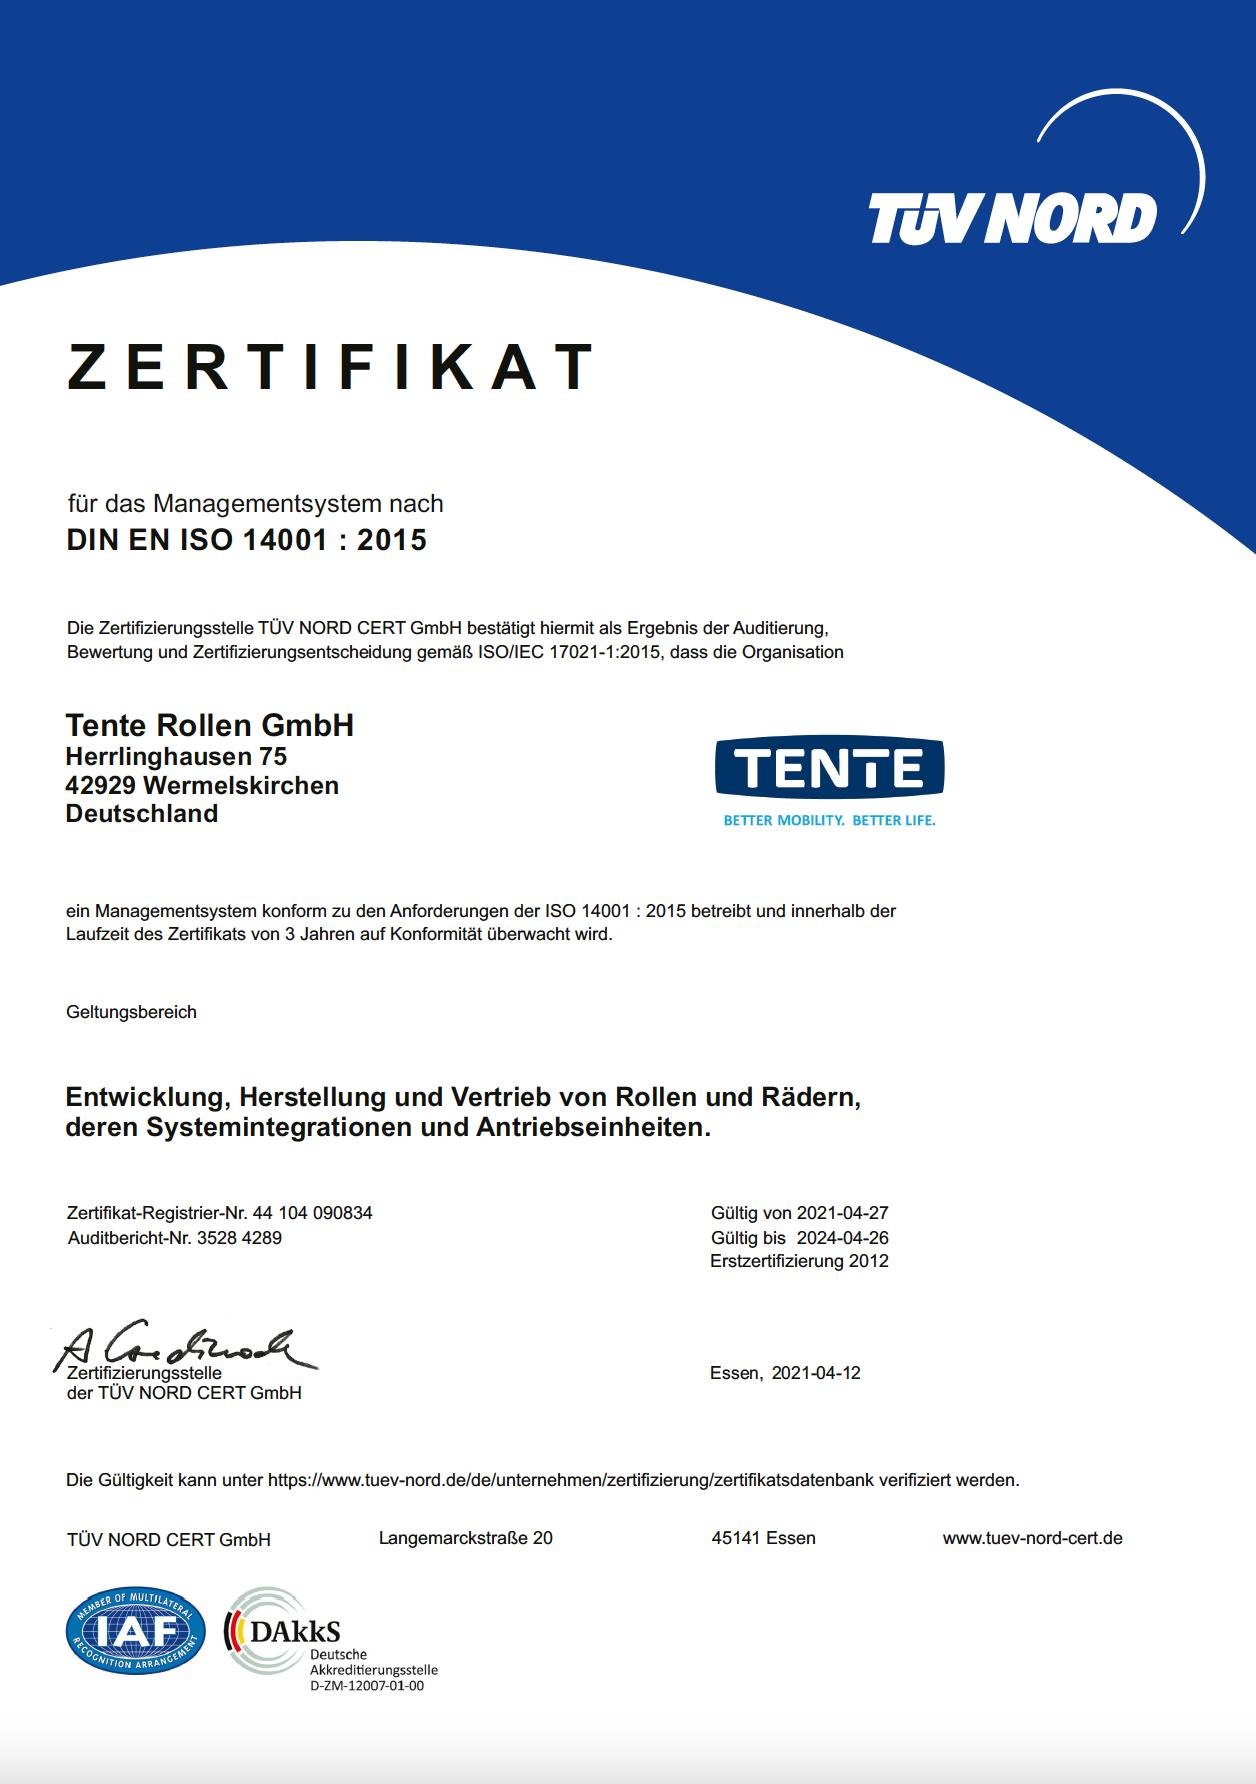 ISO 14001-sertifikat – TENTE Rollen GmbH